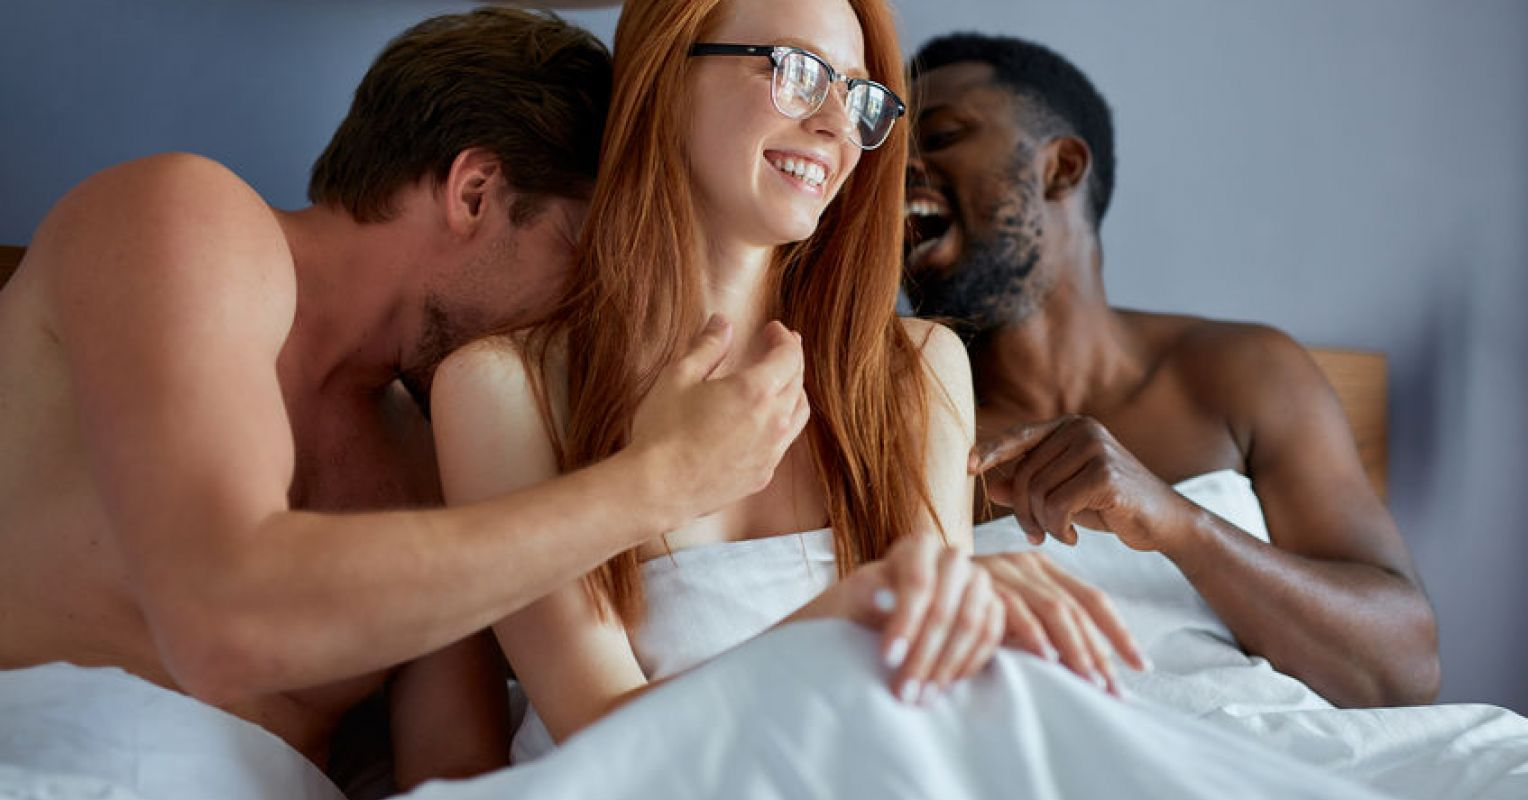 Pics threesome Free Porn